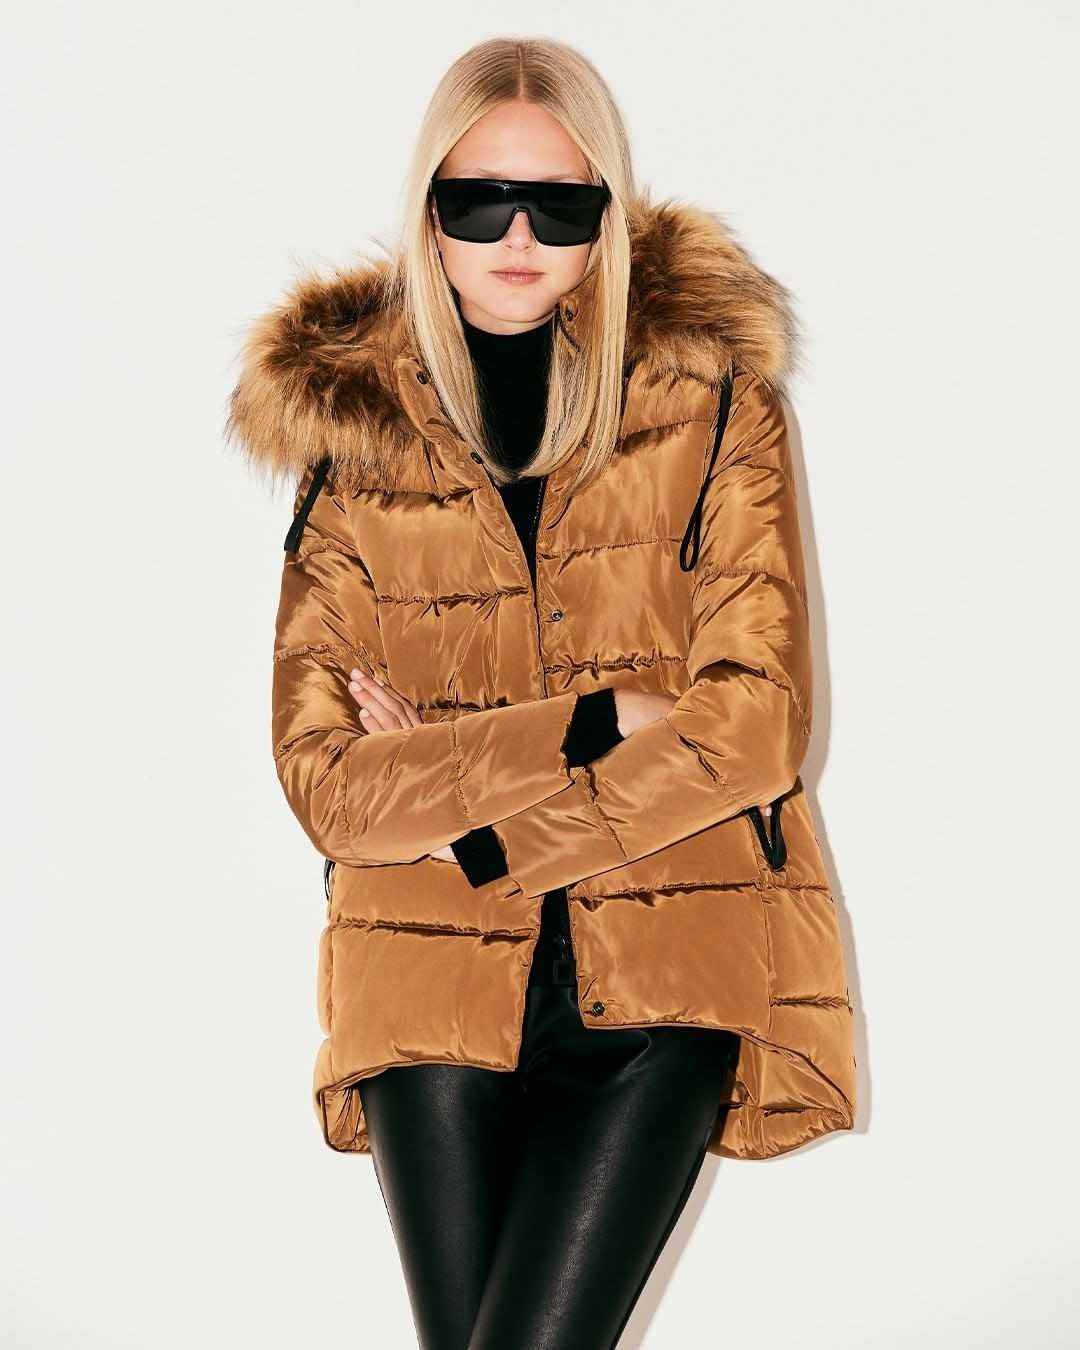 moda invierno 2021 camperas inflables mujer